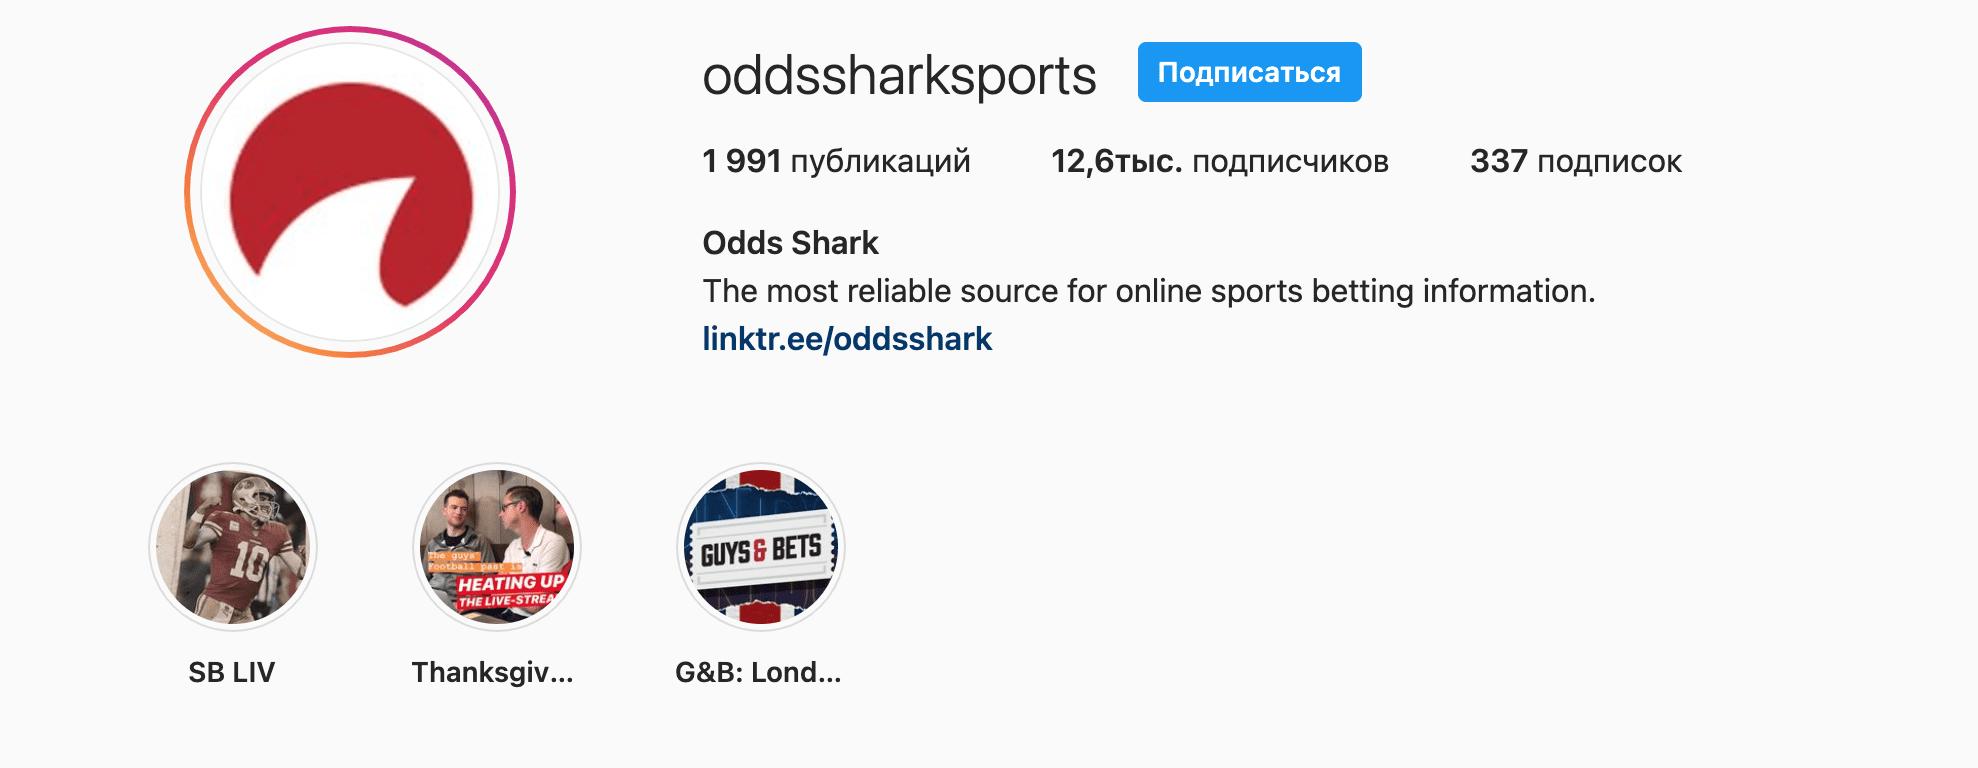 Инстаграм Oddsshark.com